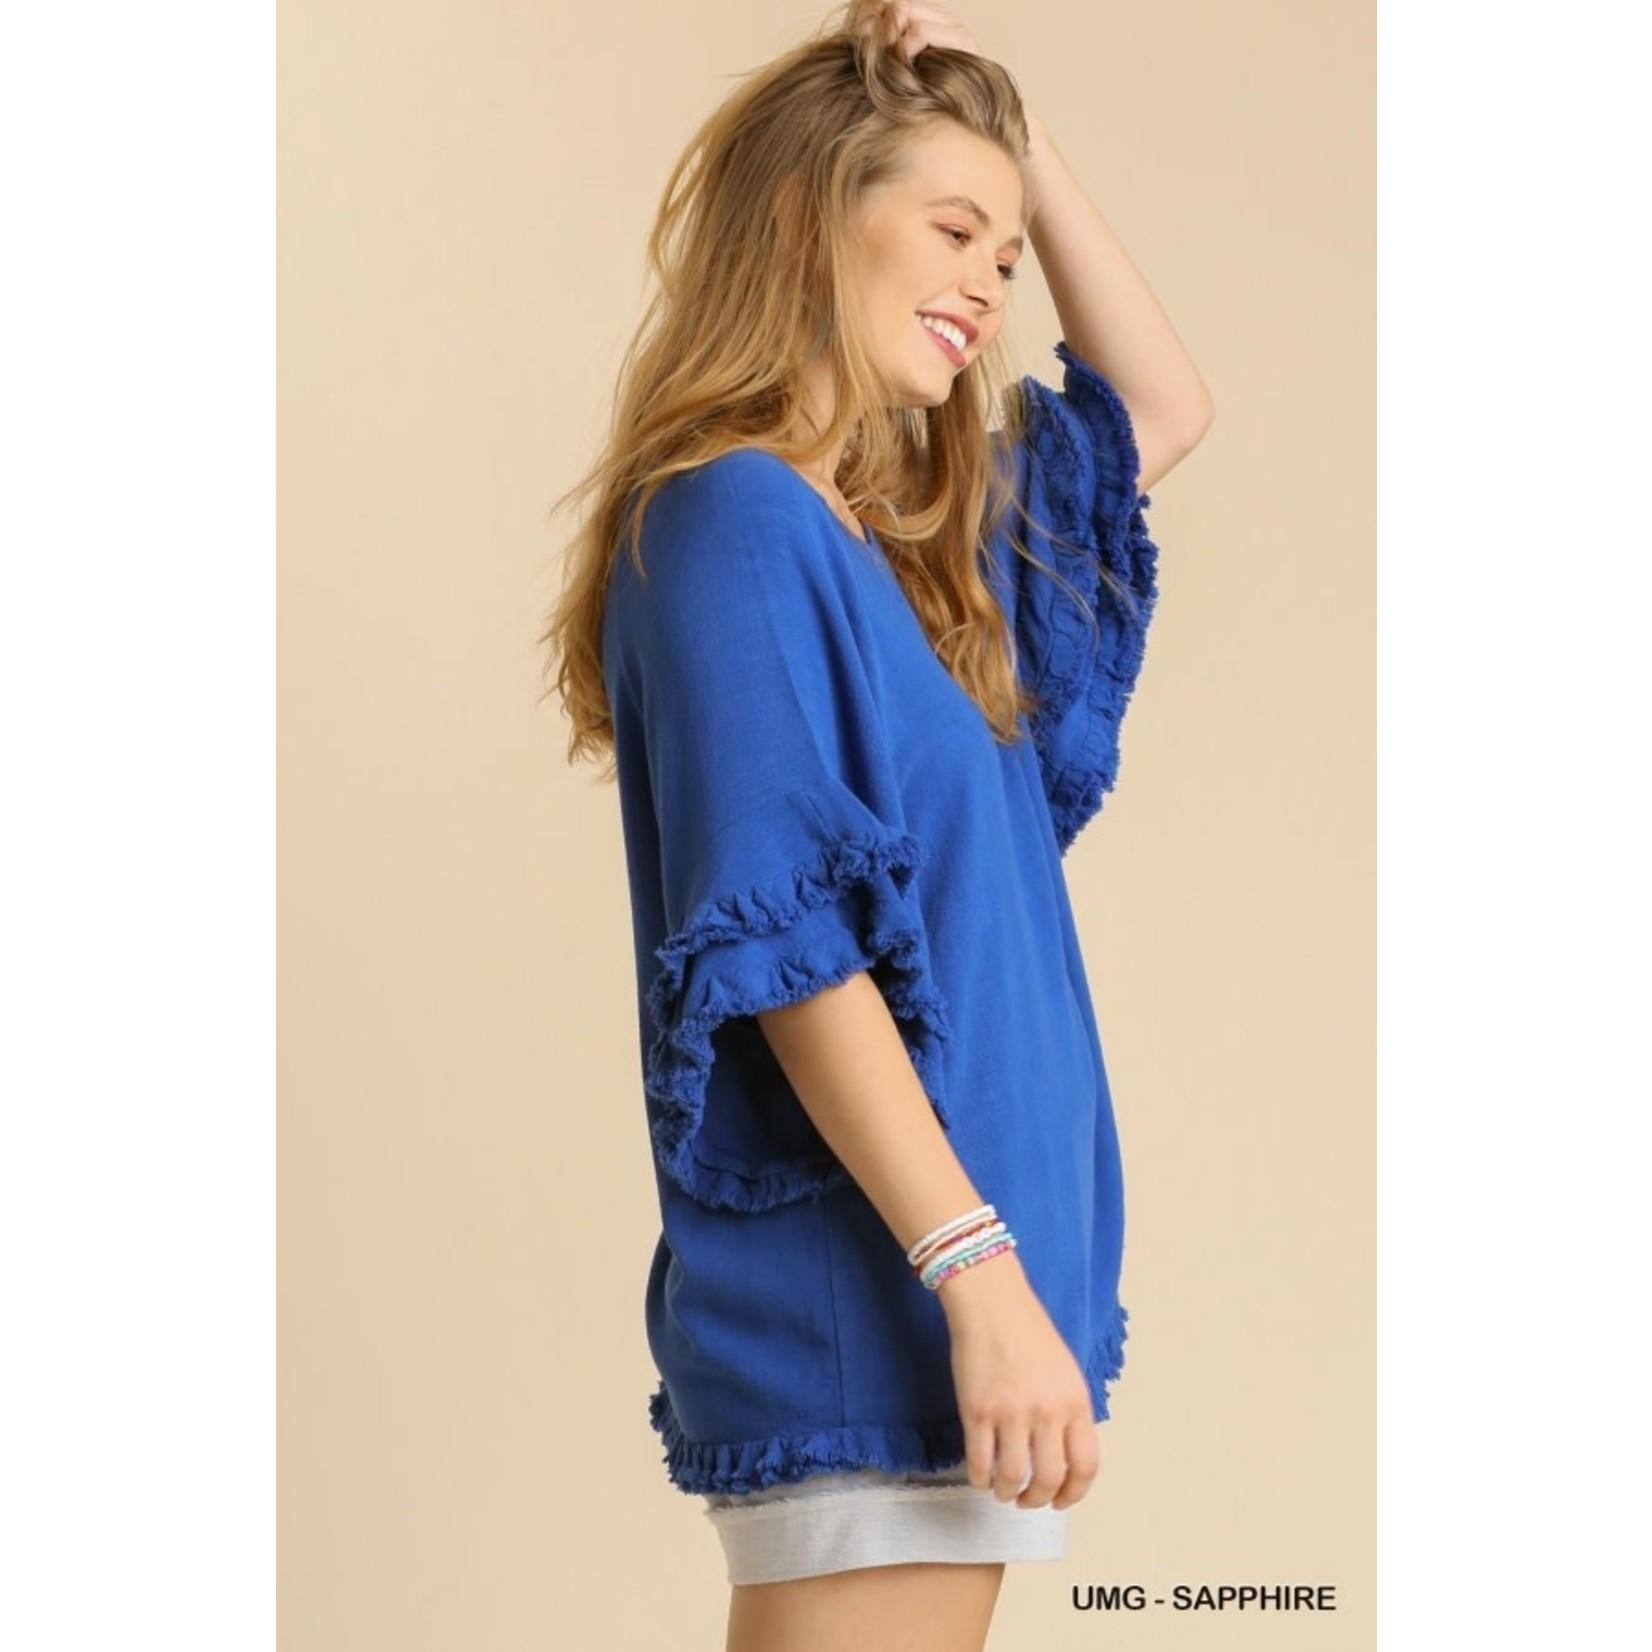 Umgee Ruffle Sleeve Top with Frayed Hem Sapphire